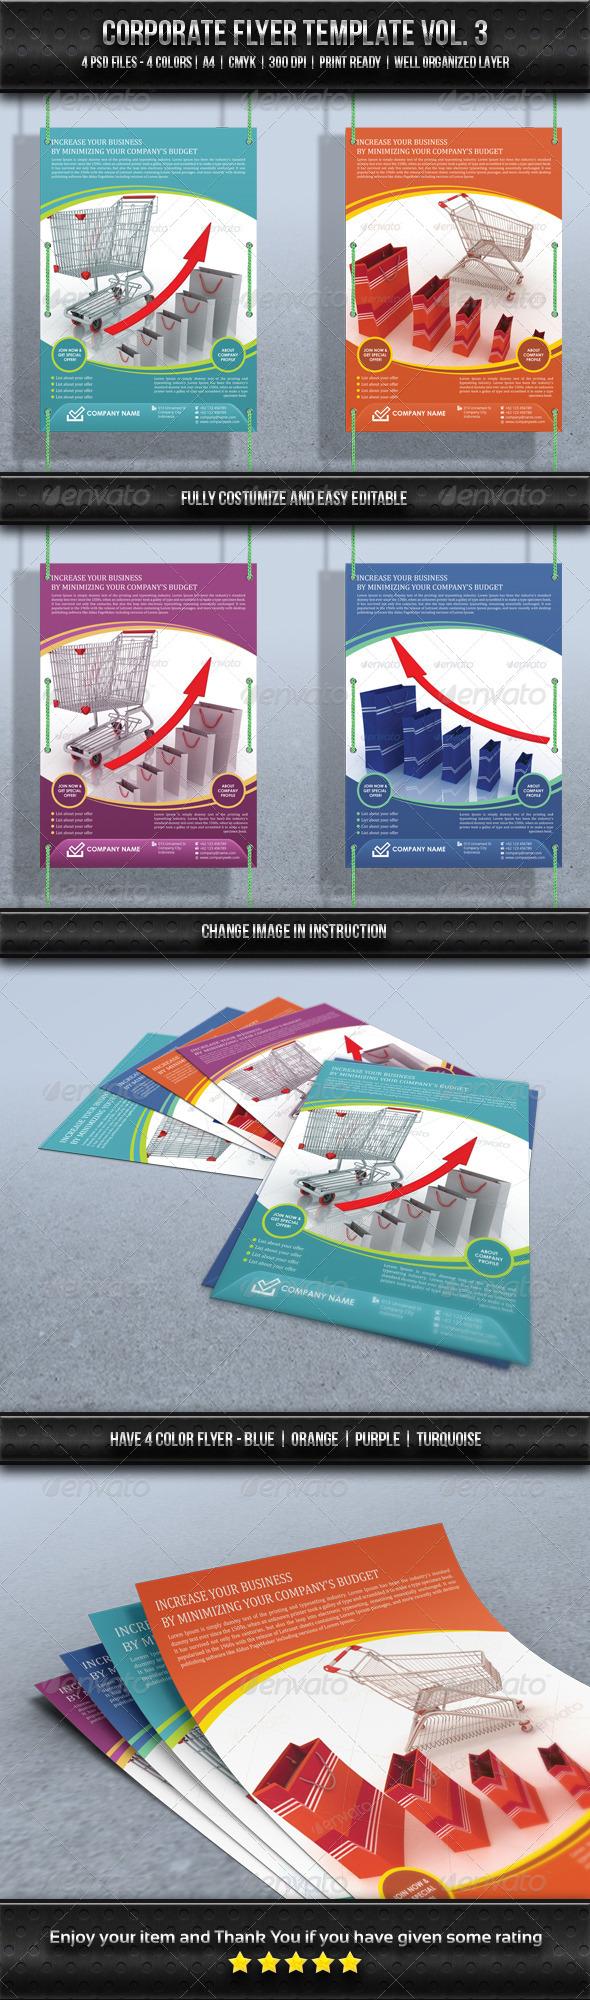 GraphicRiver Corporate Flyer Template Vol 3 8713899